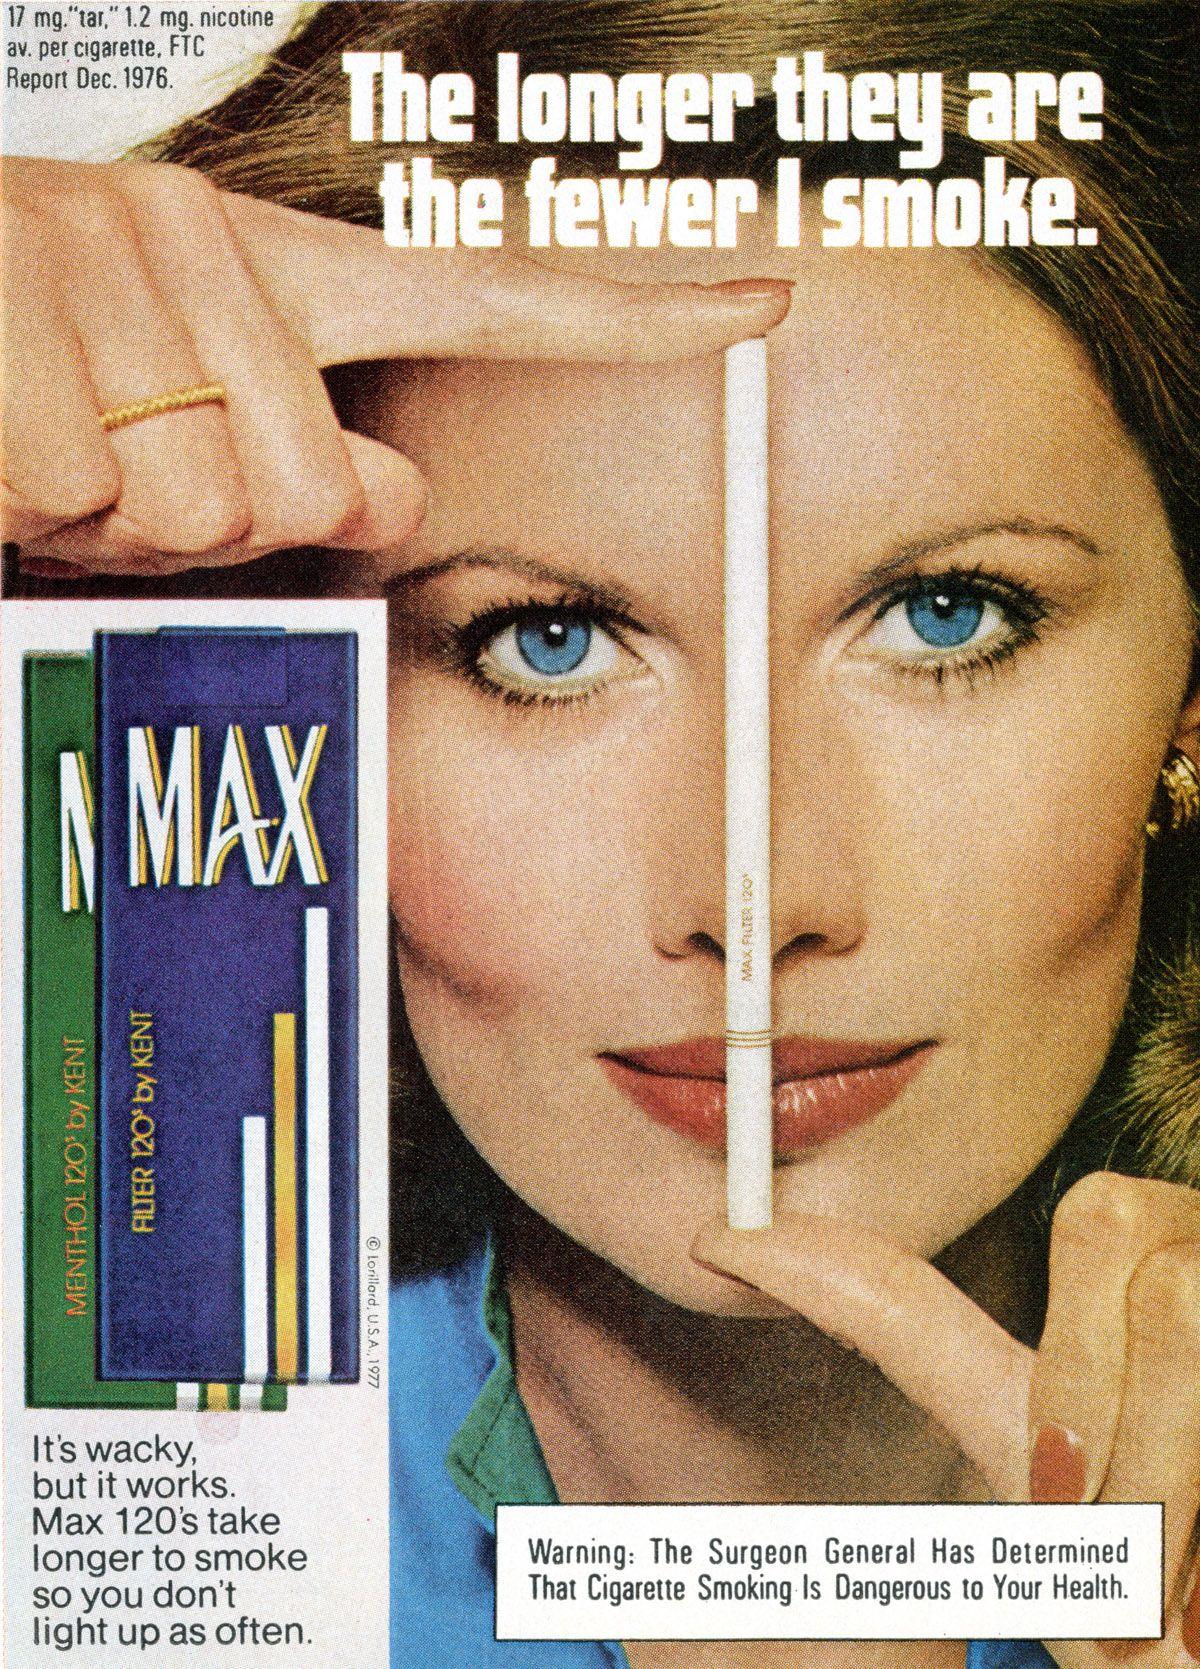 Pin soma riki on tabacco cigarette pinterest more menthol advertisement jpg  1200x1669 More 120s menthol advertisement